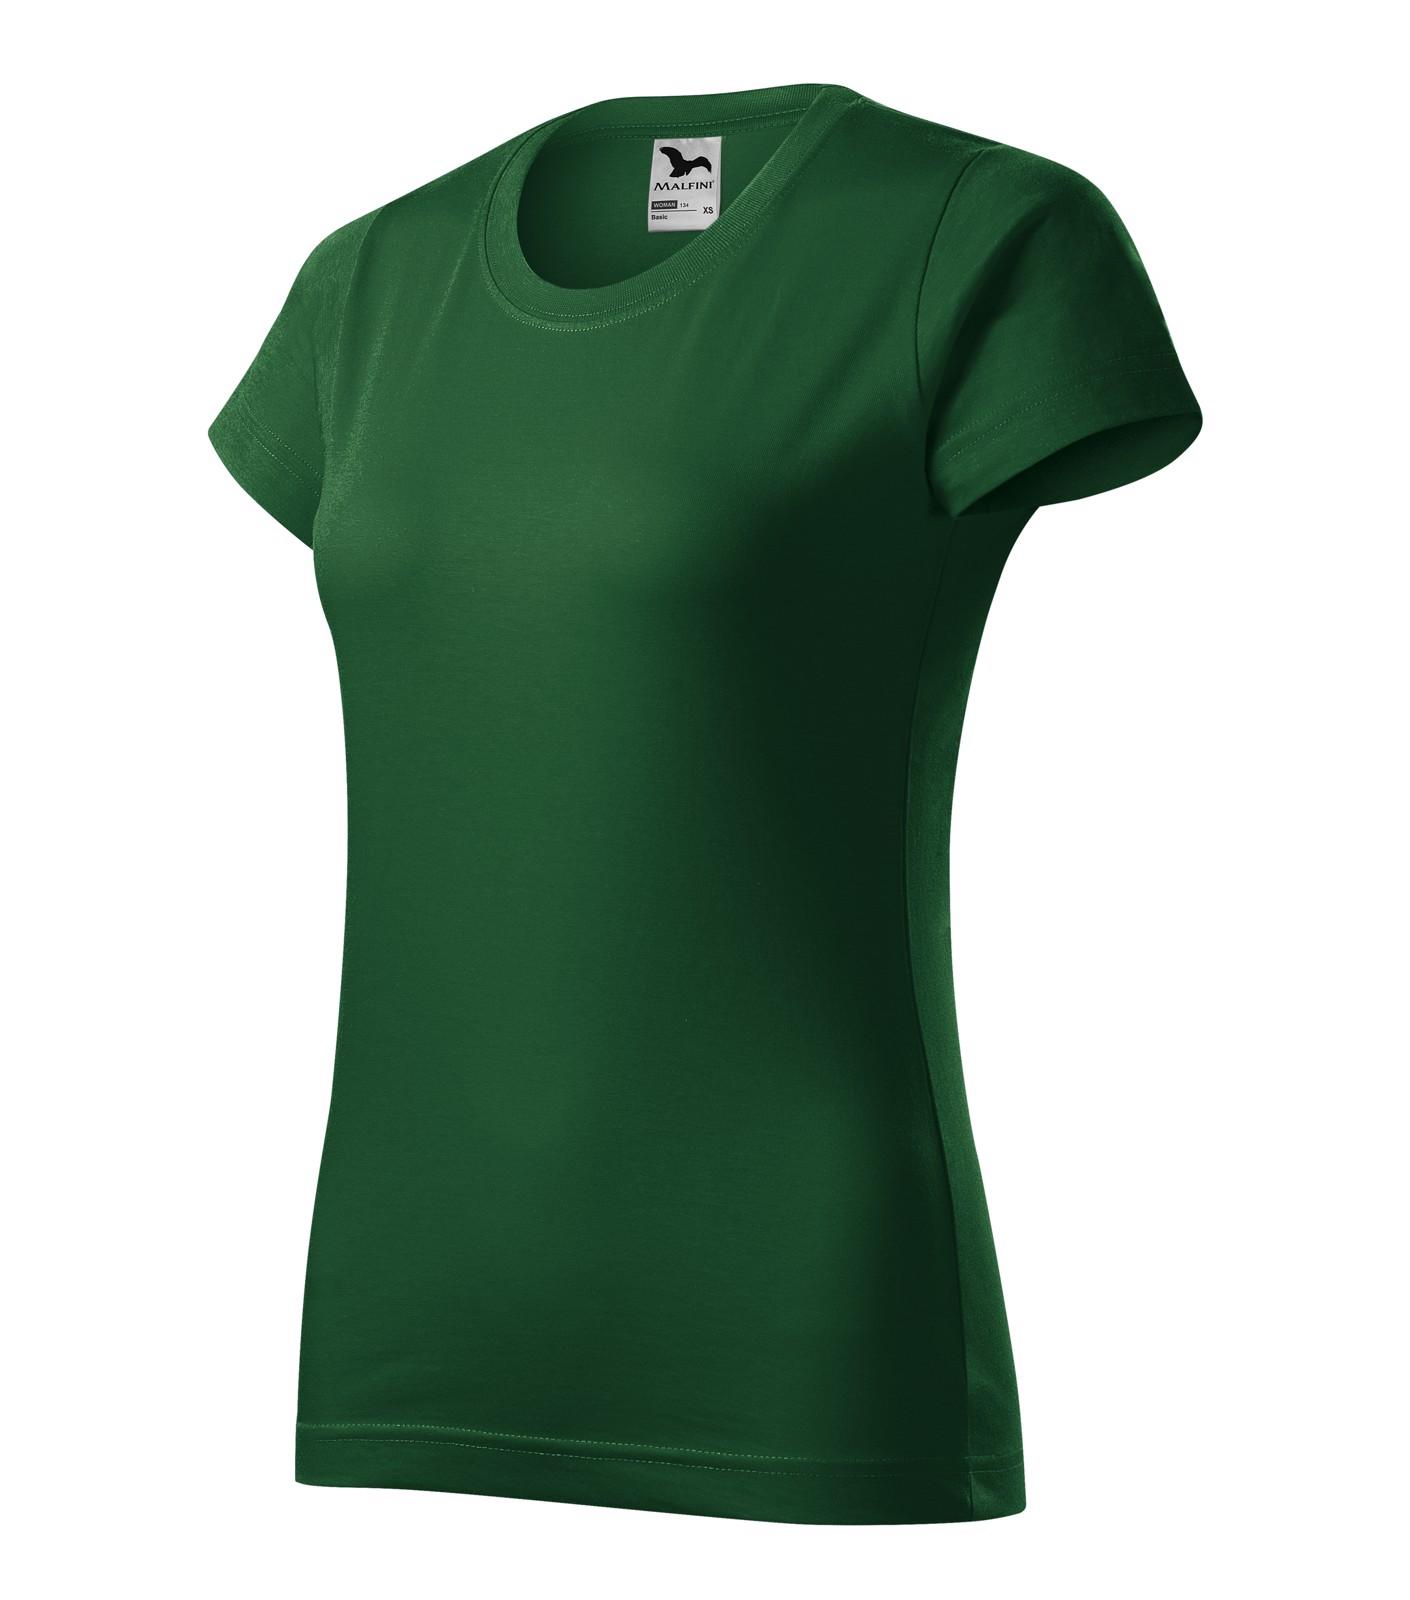 T-shirt women's Malfini Basic - Bottle Green / XL